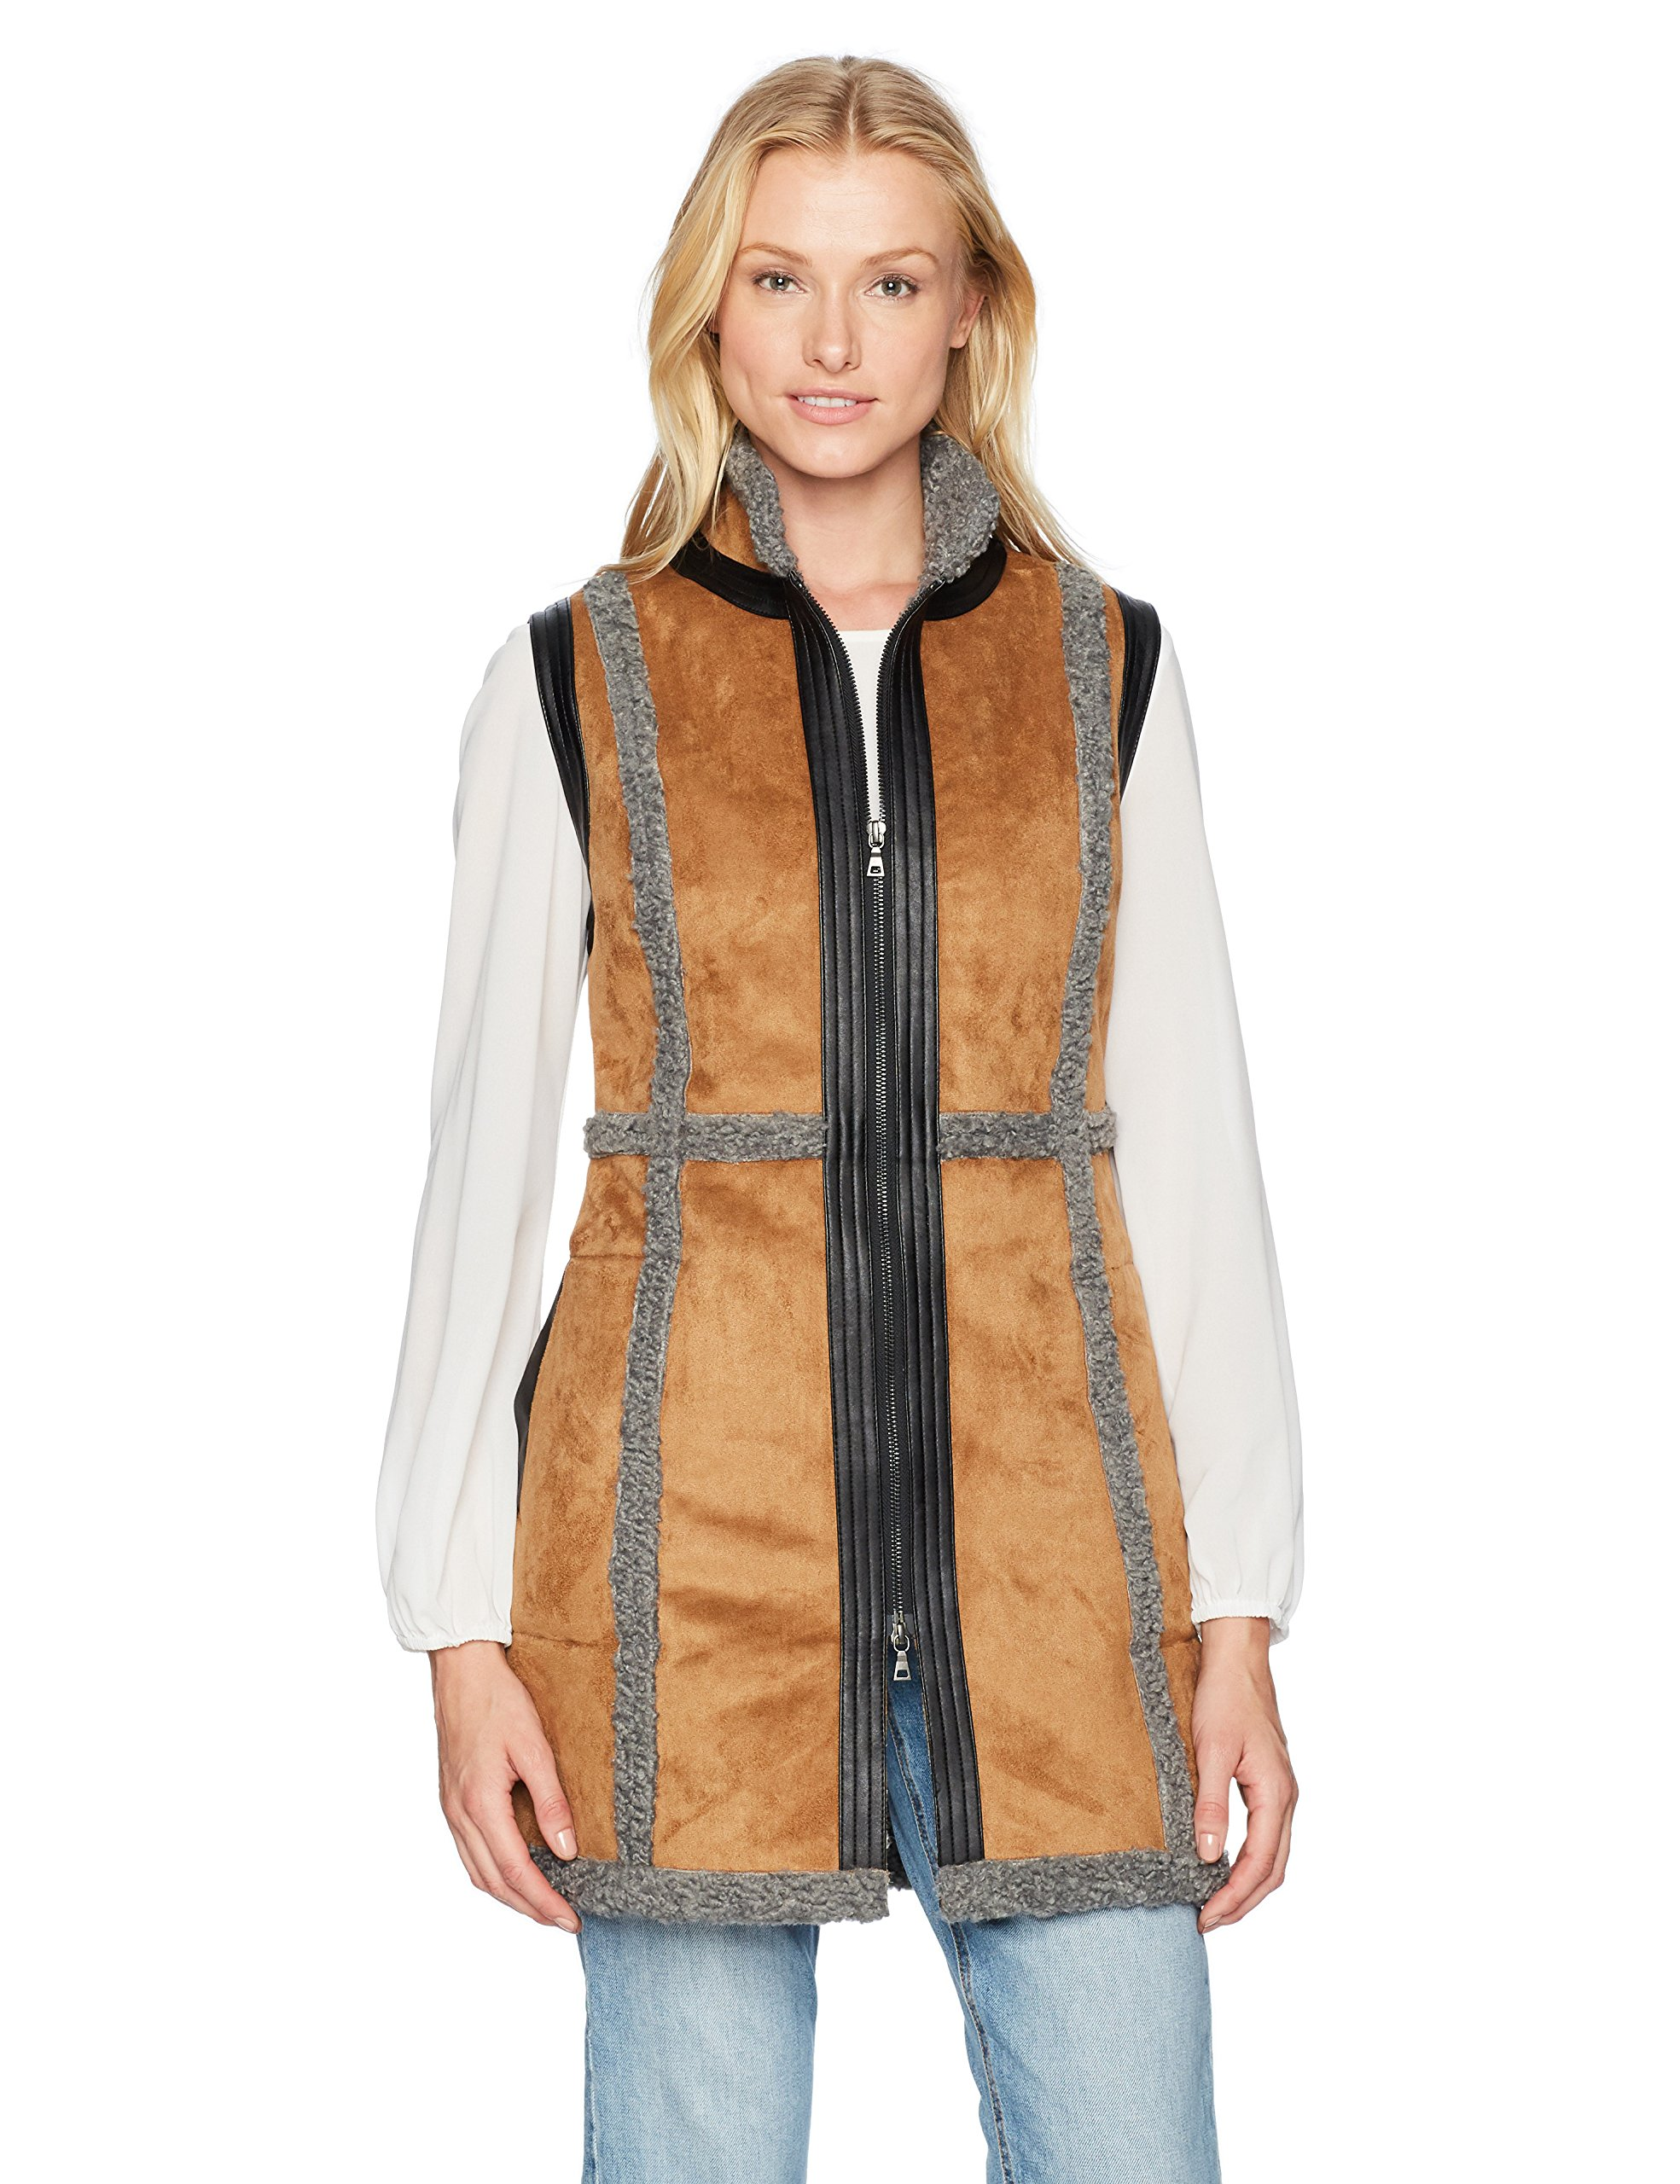 NIC+ZOE Women's Heritage Vest, Multi, S